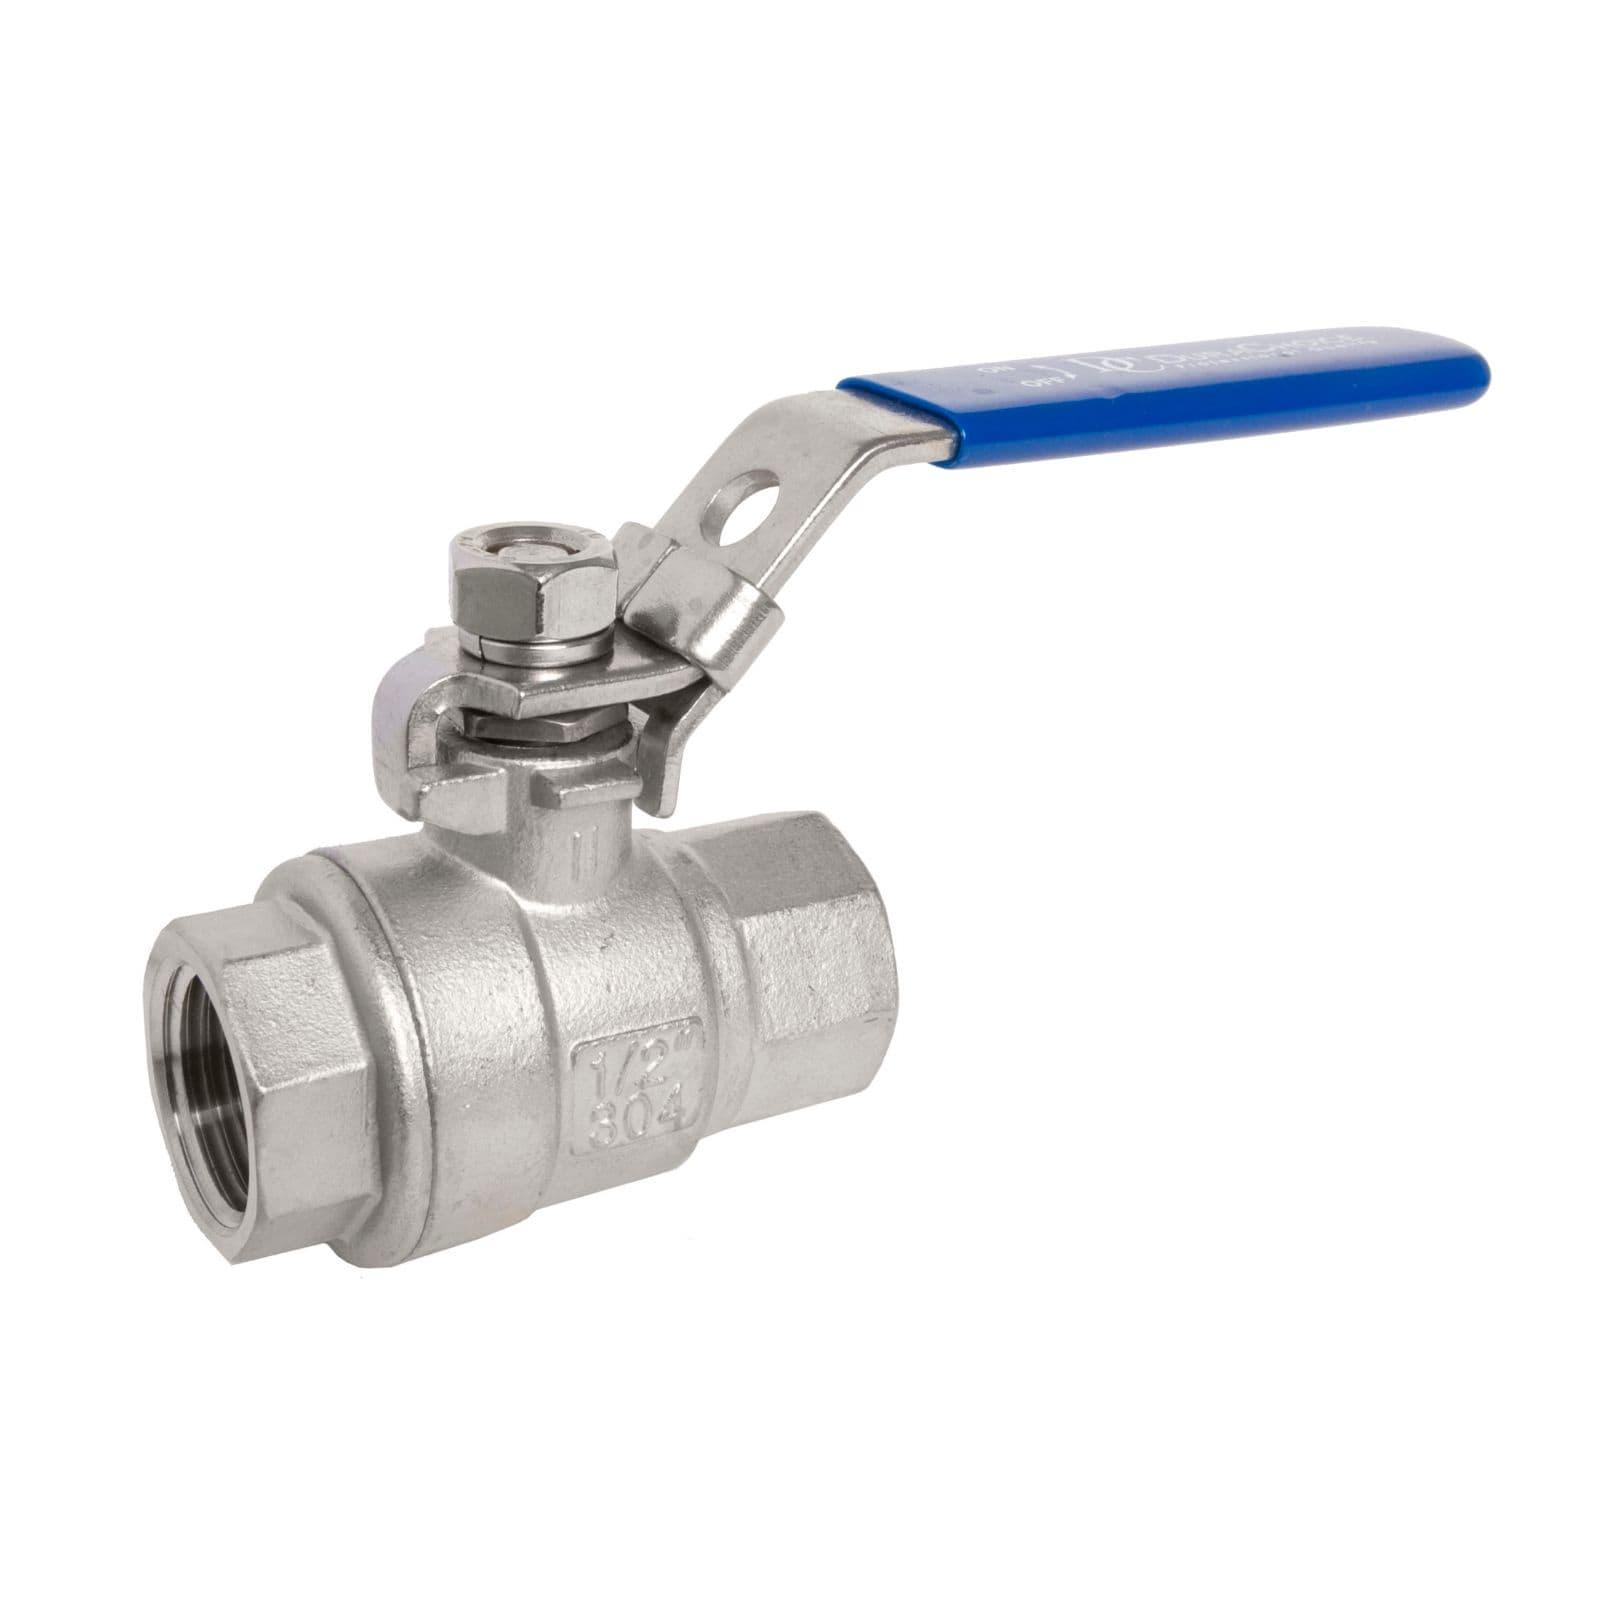 Hydraulikpumpe Zahnradpumpe 42ccm linksdrehend BG3